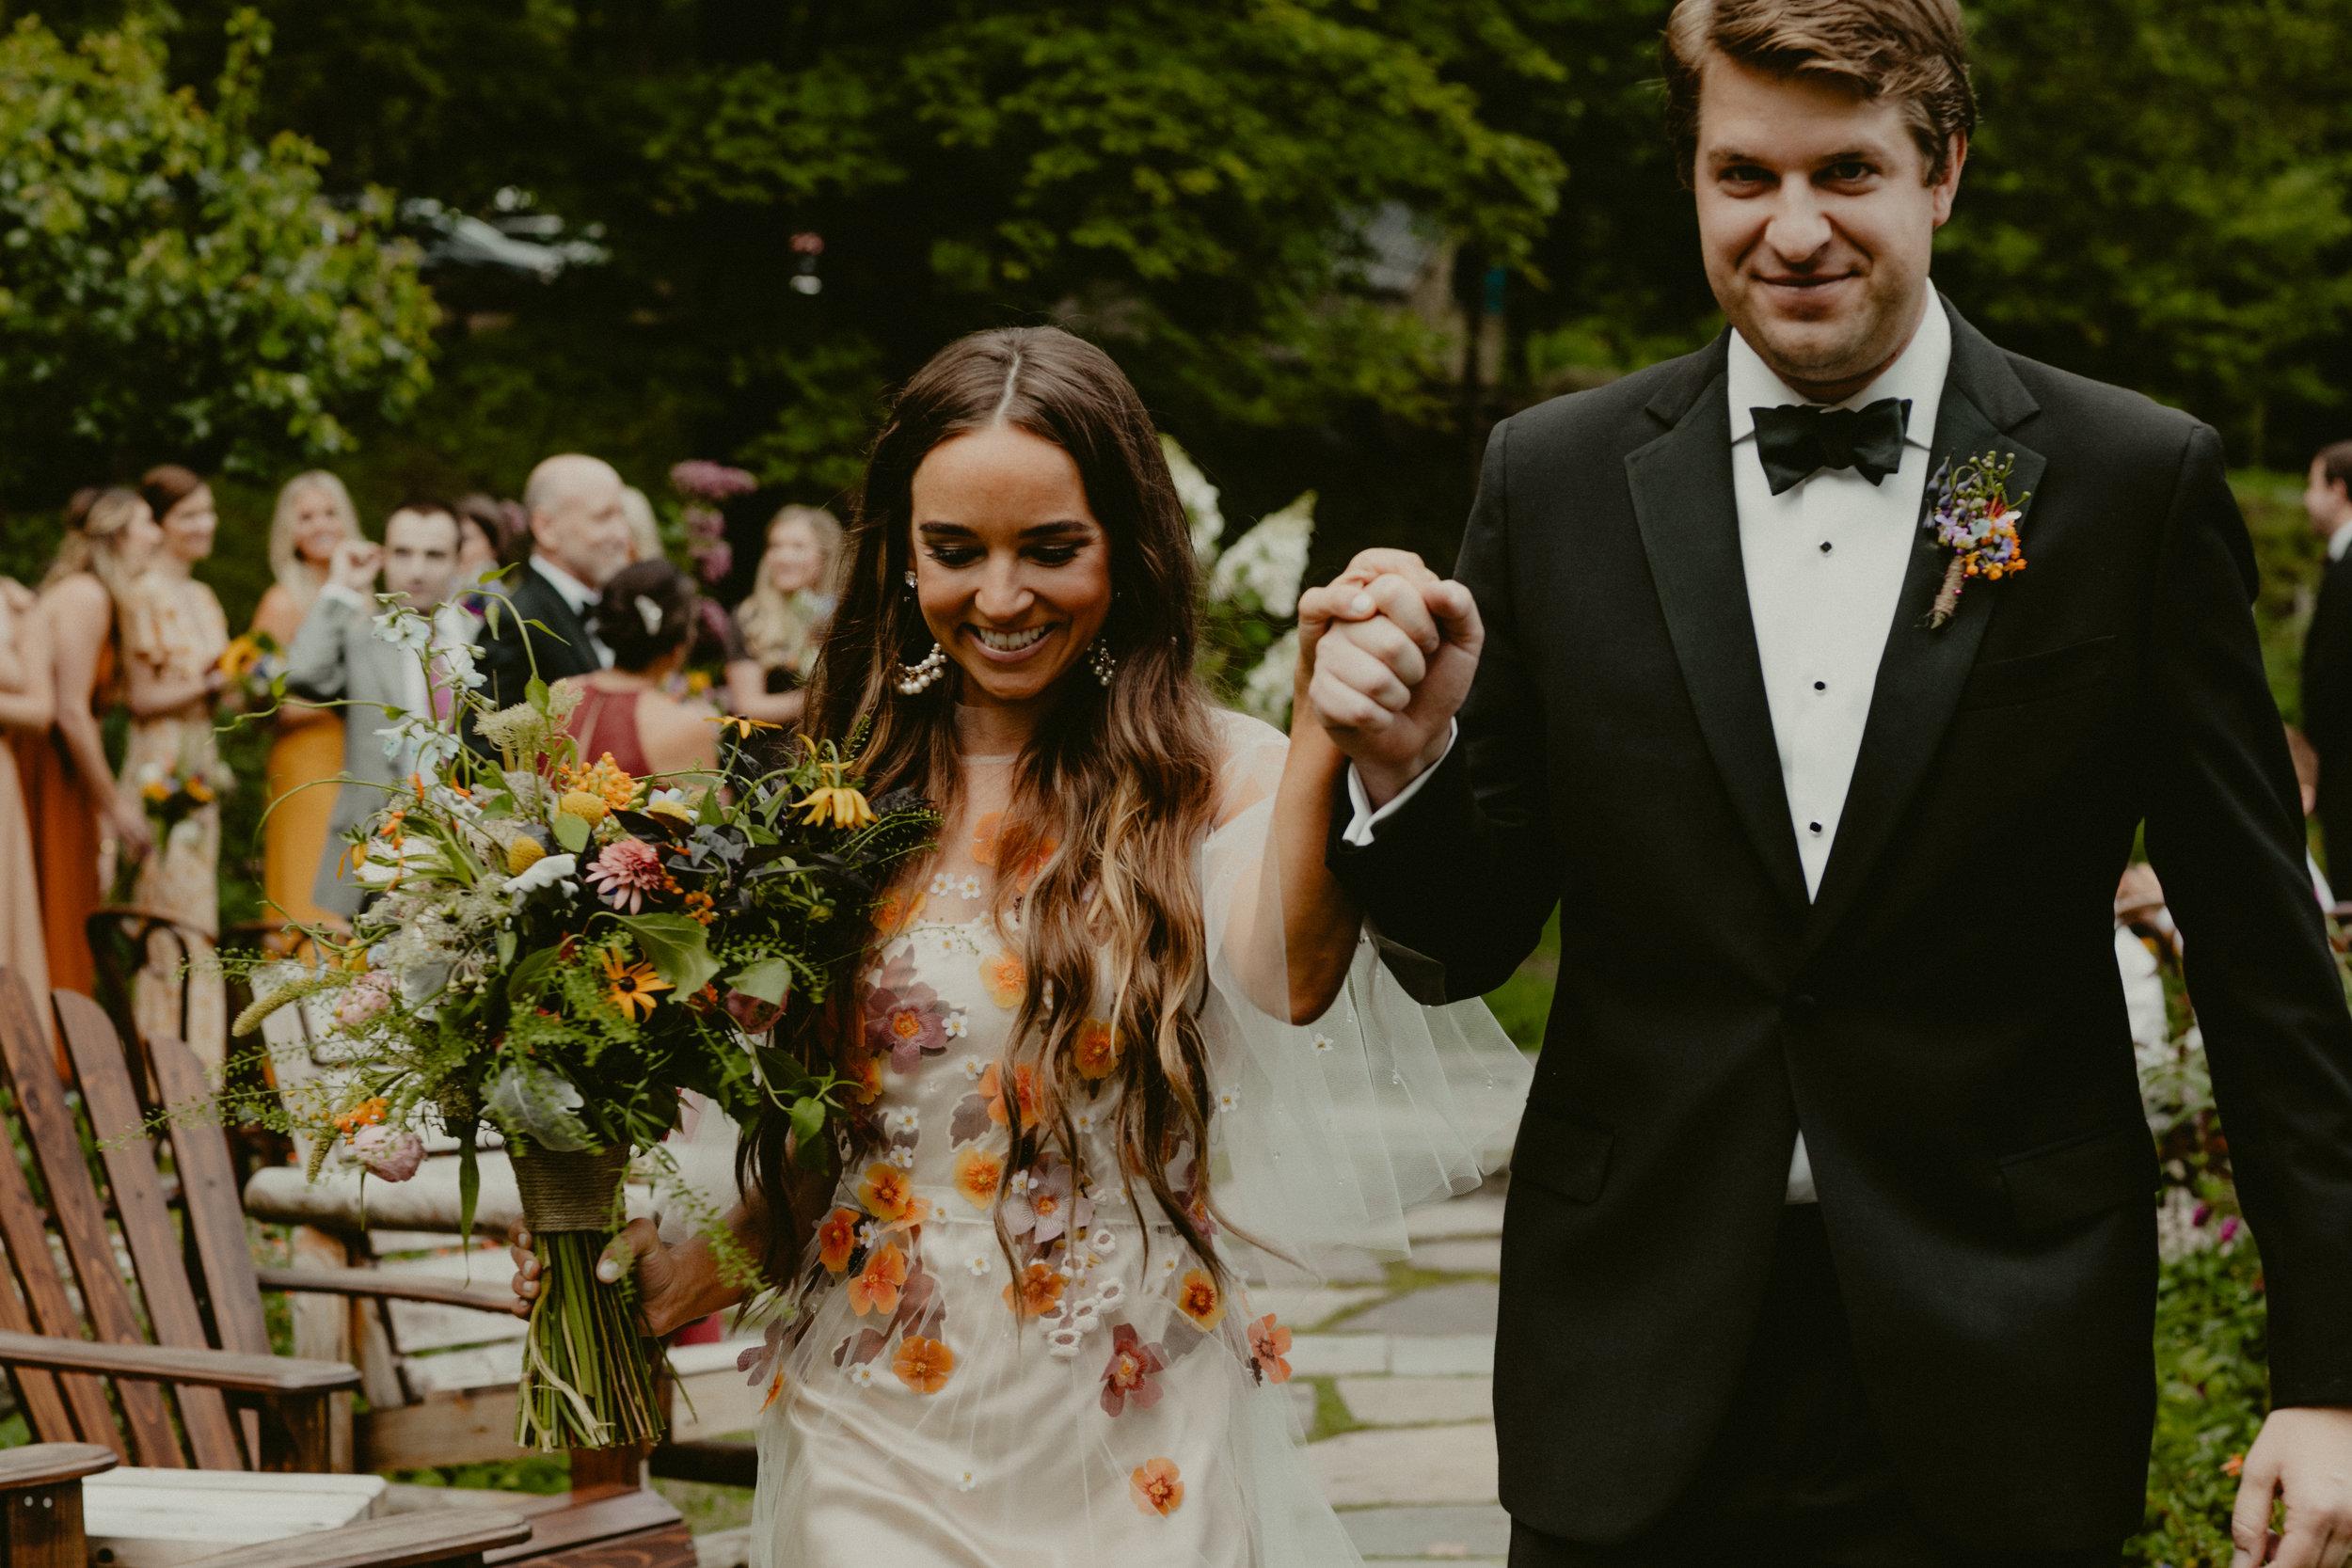 DEER_MOUNTAIN_INN_WEDDING_CHELLISE_MICHAEL_PHOTOGRAPHY-1413.jpg